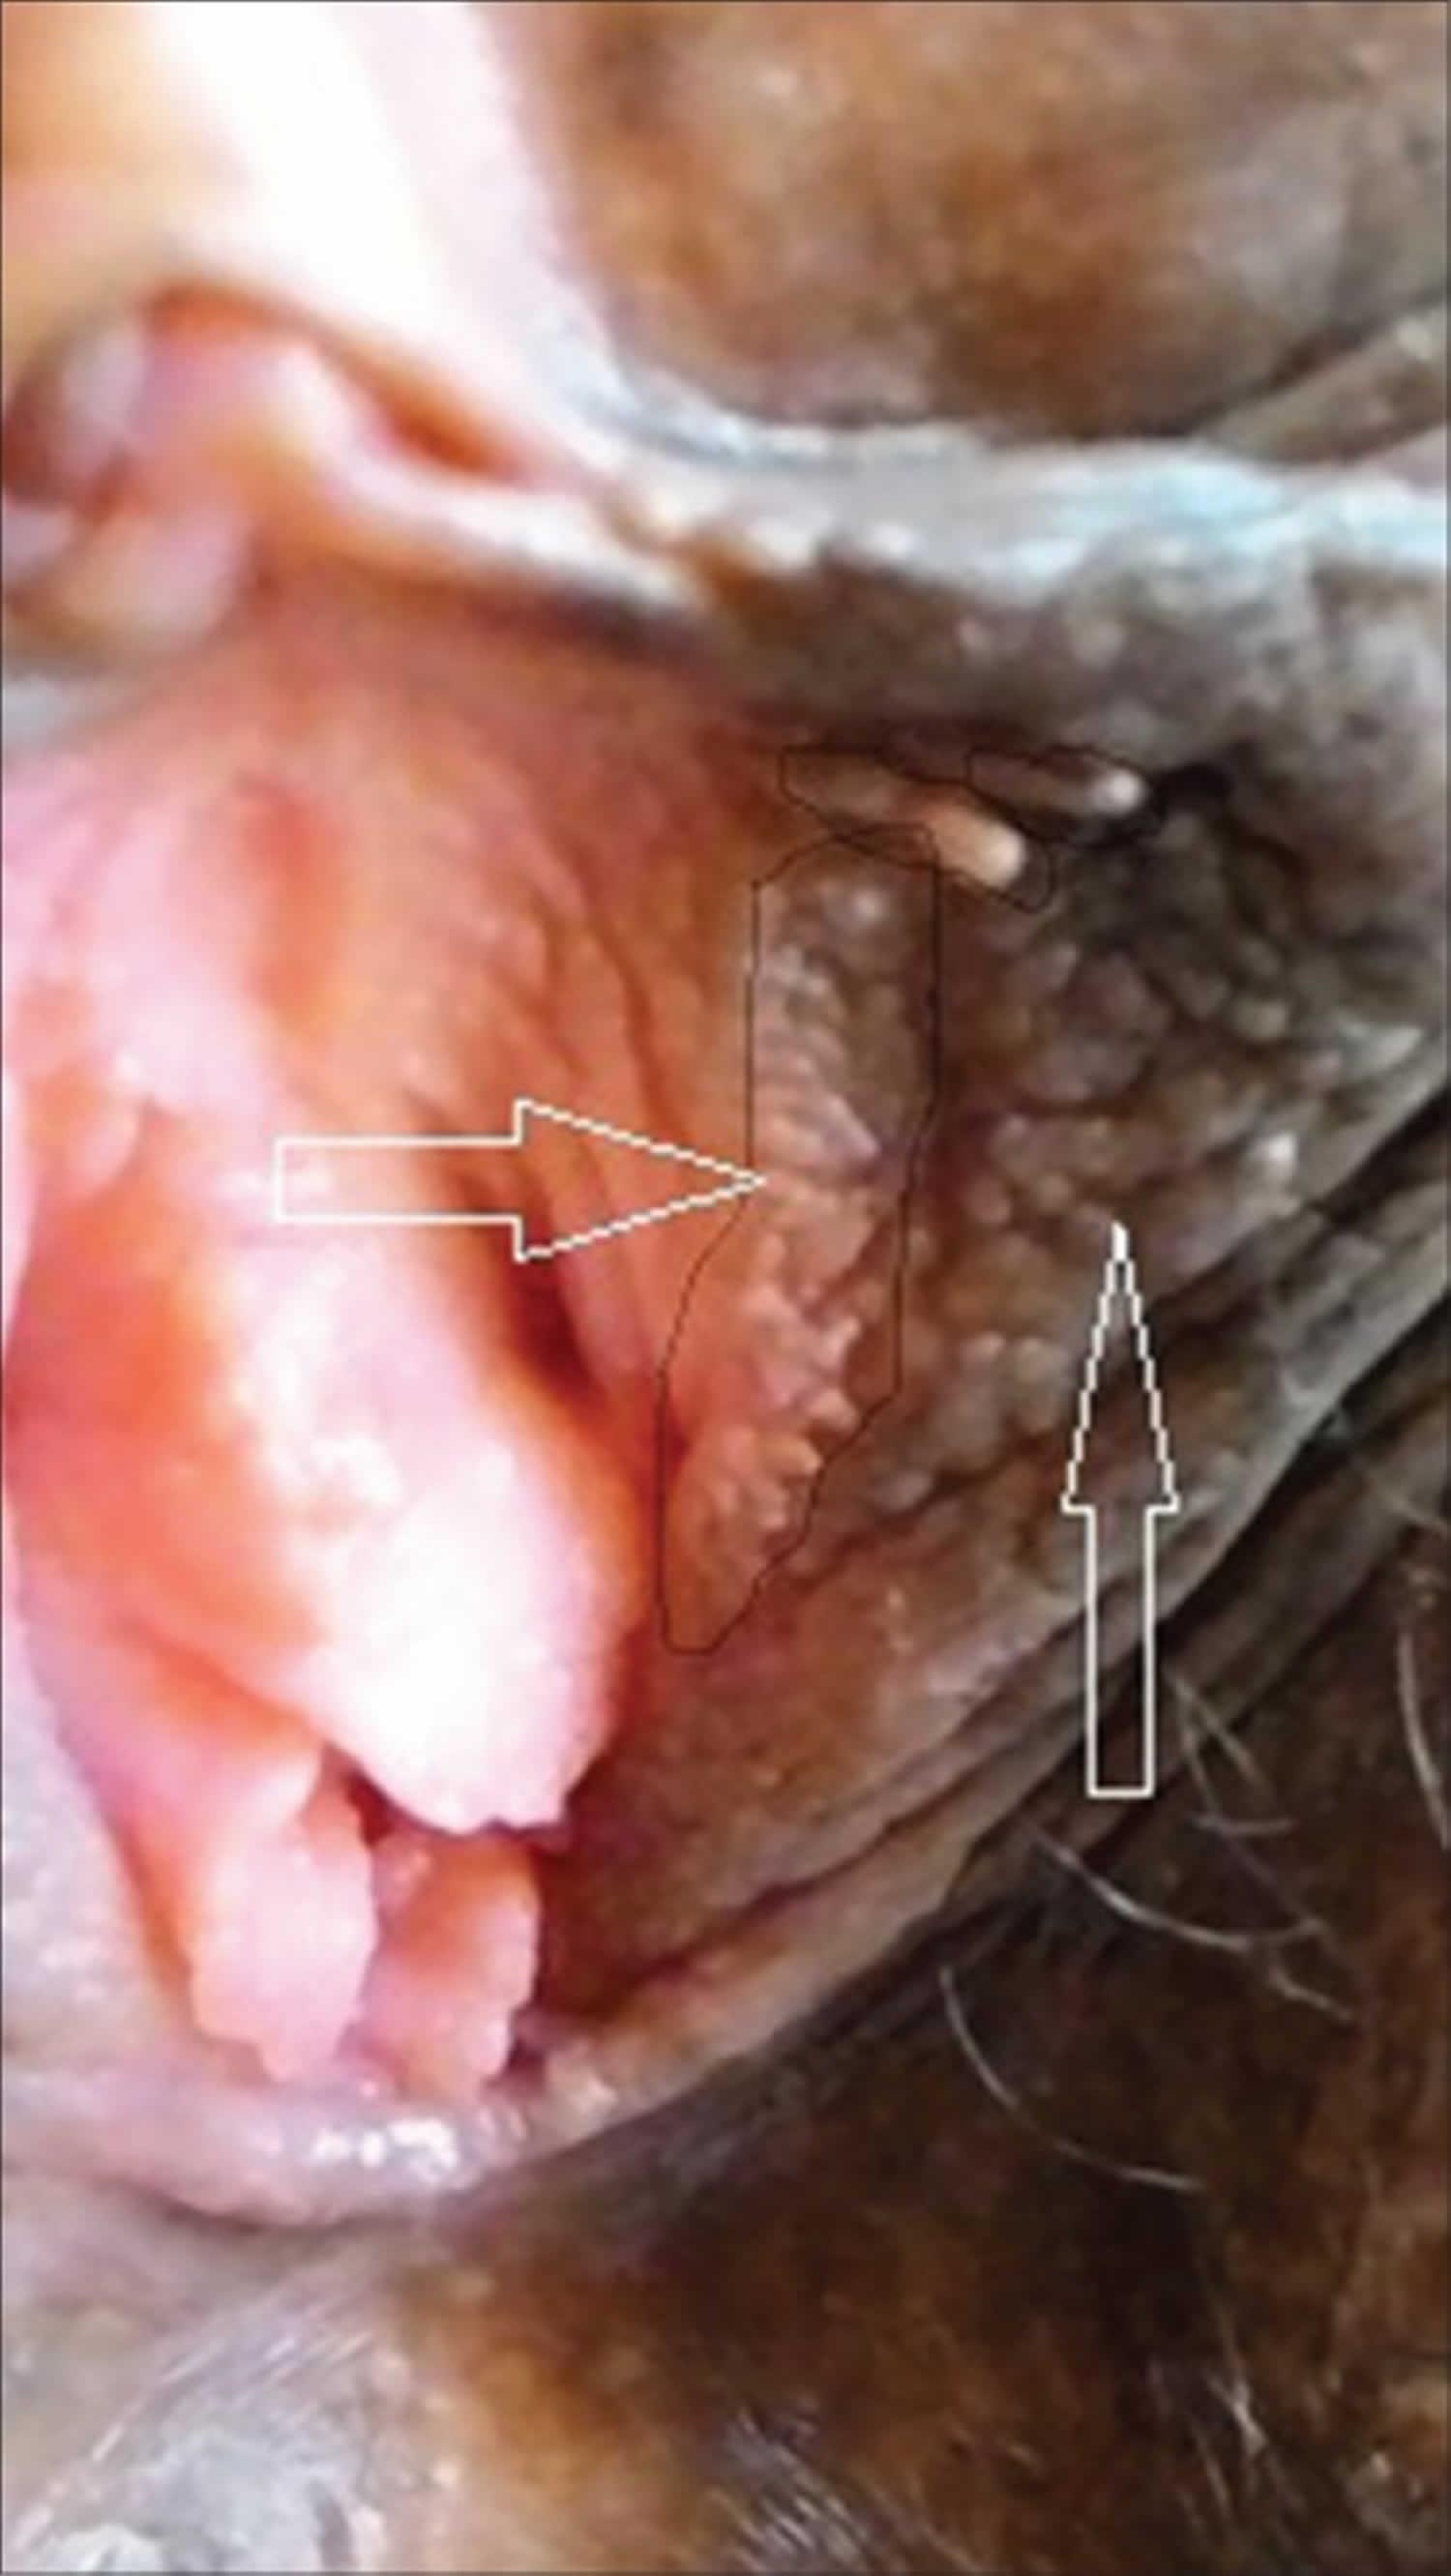 vestibular papillomatosis cream hpv et urticaire